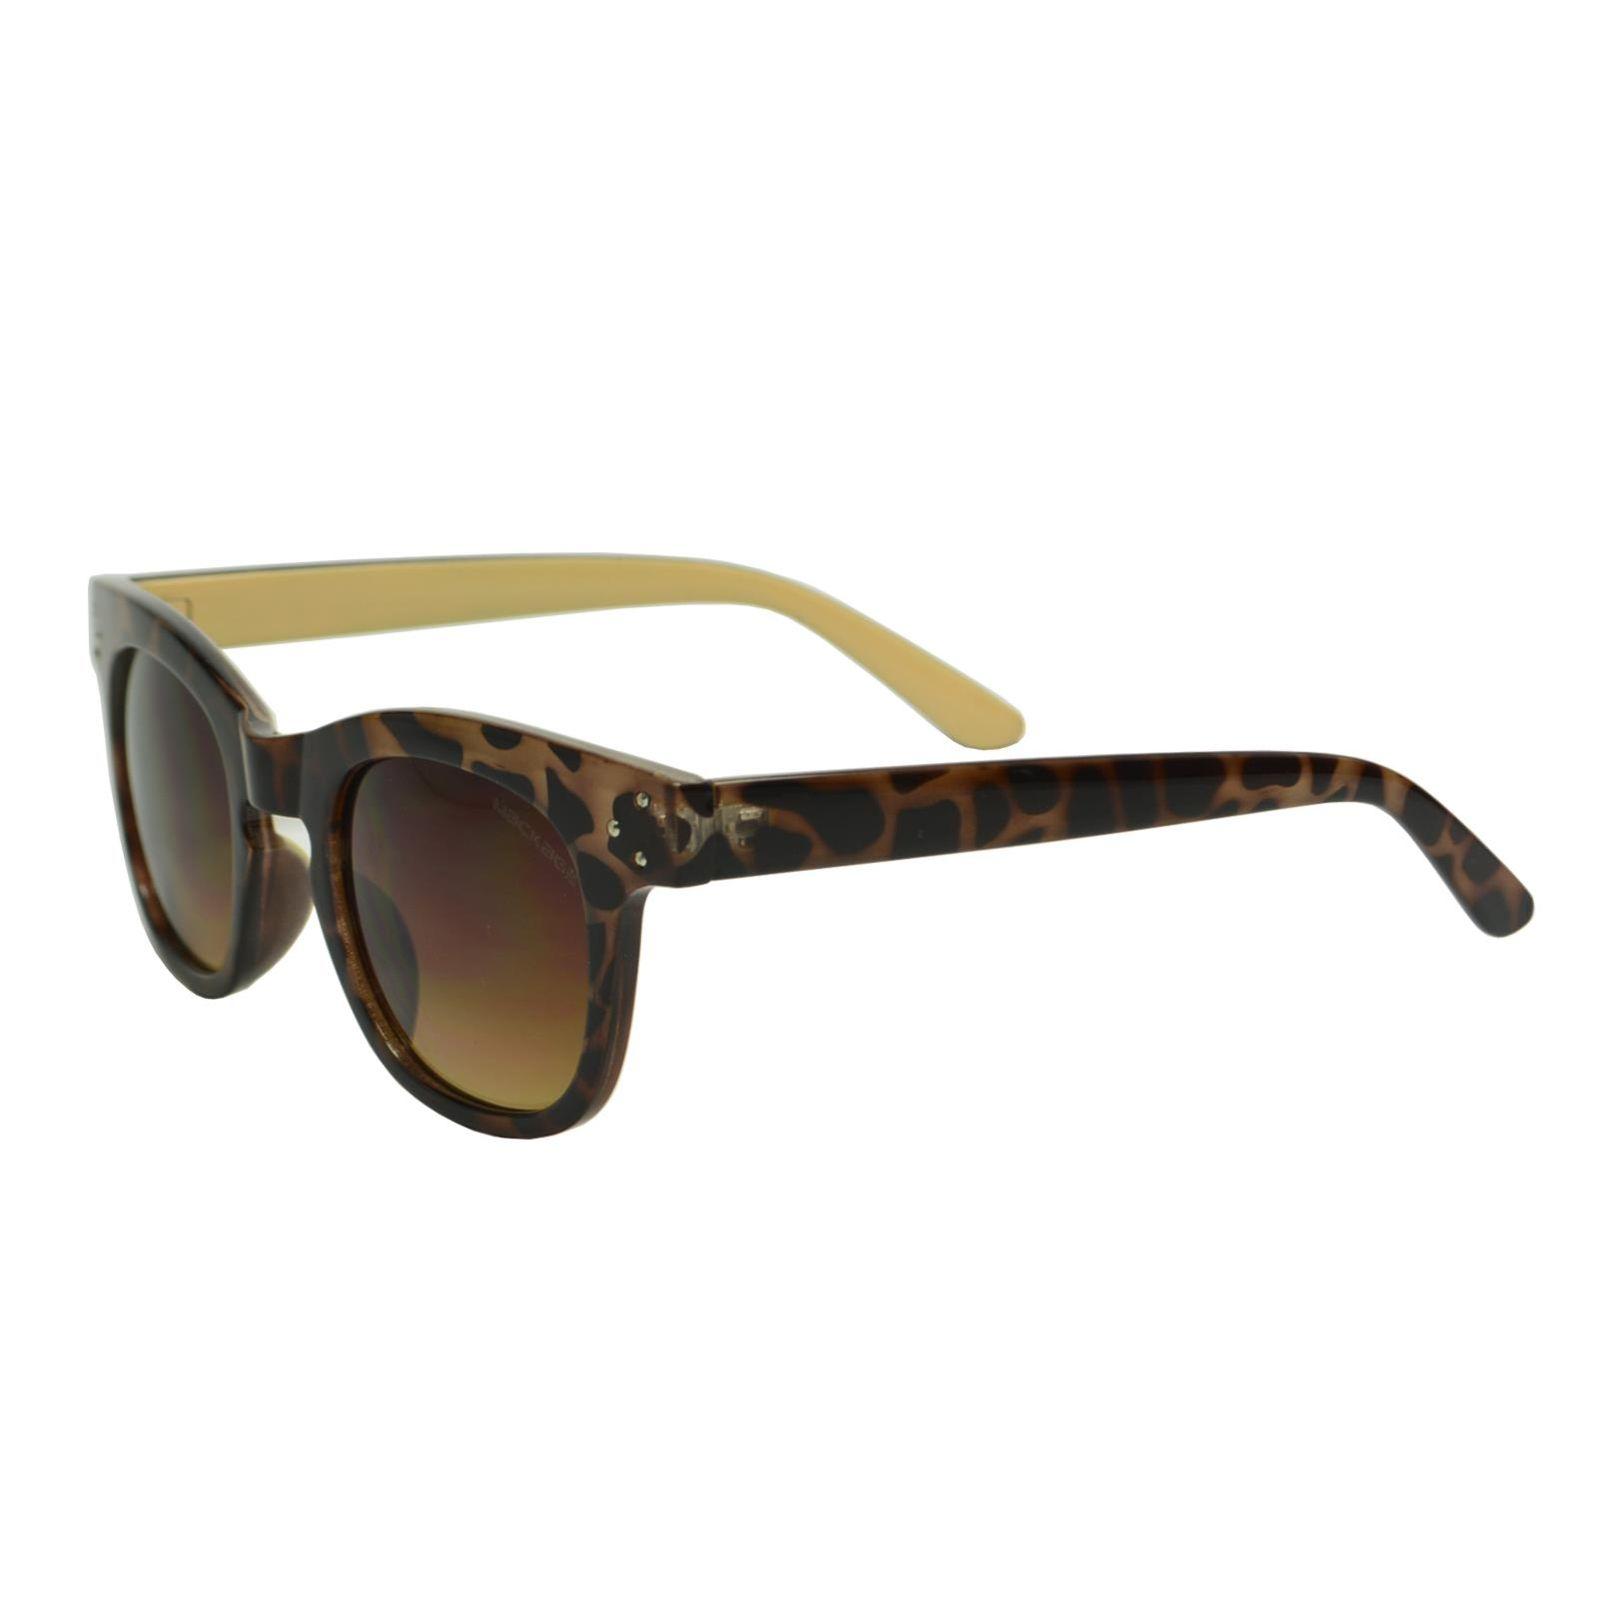 Óculos Mackage MK2114 - Onça / Marrom